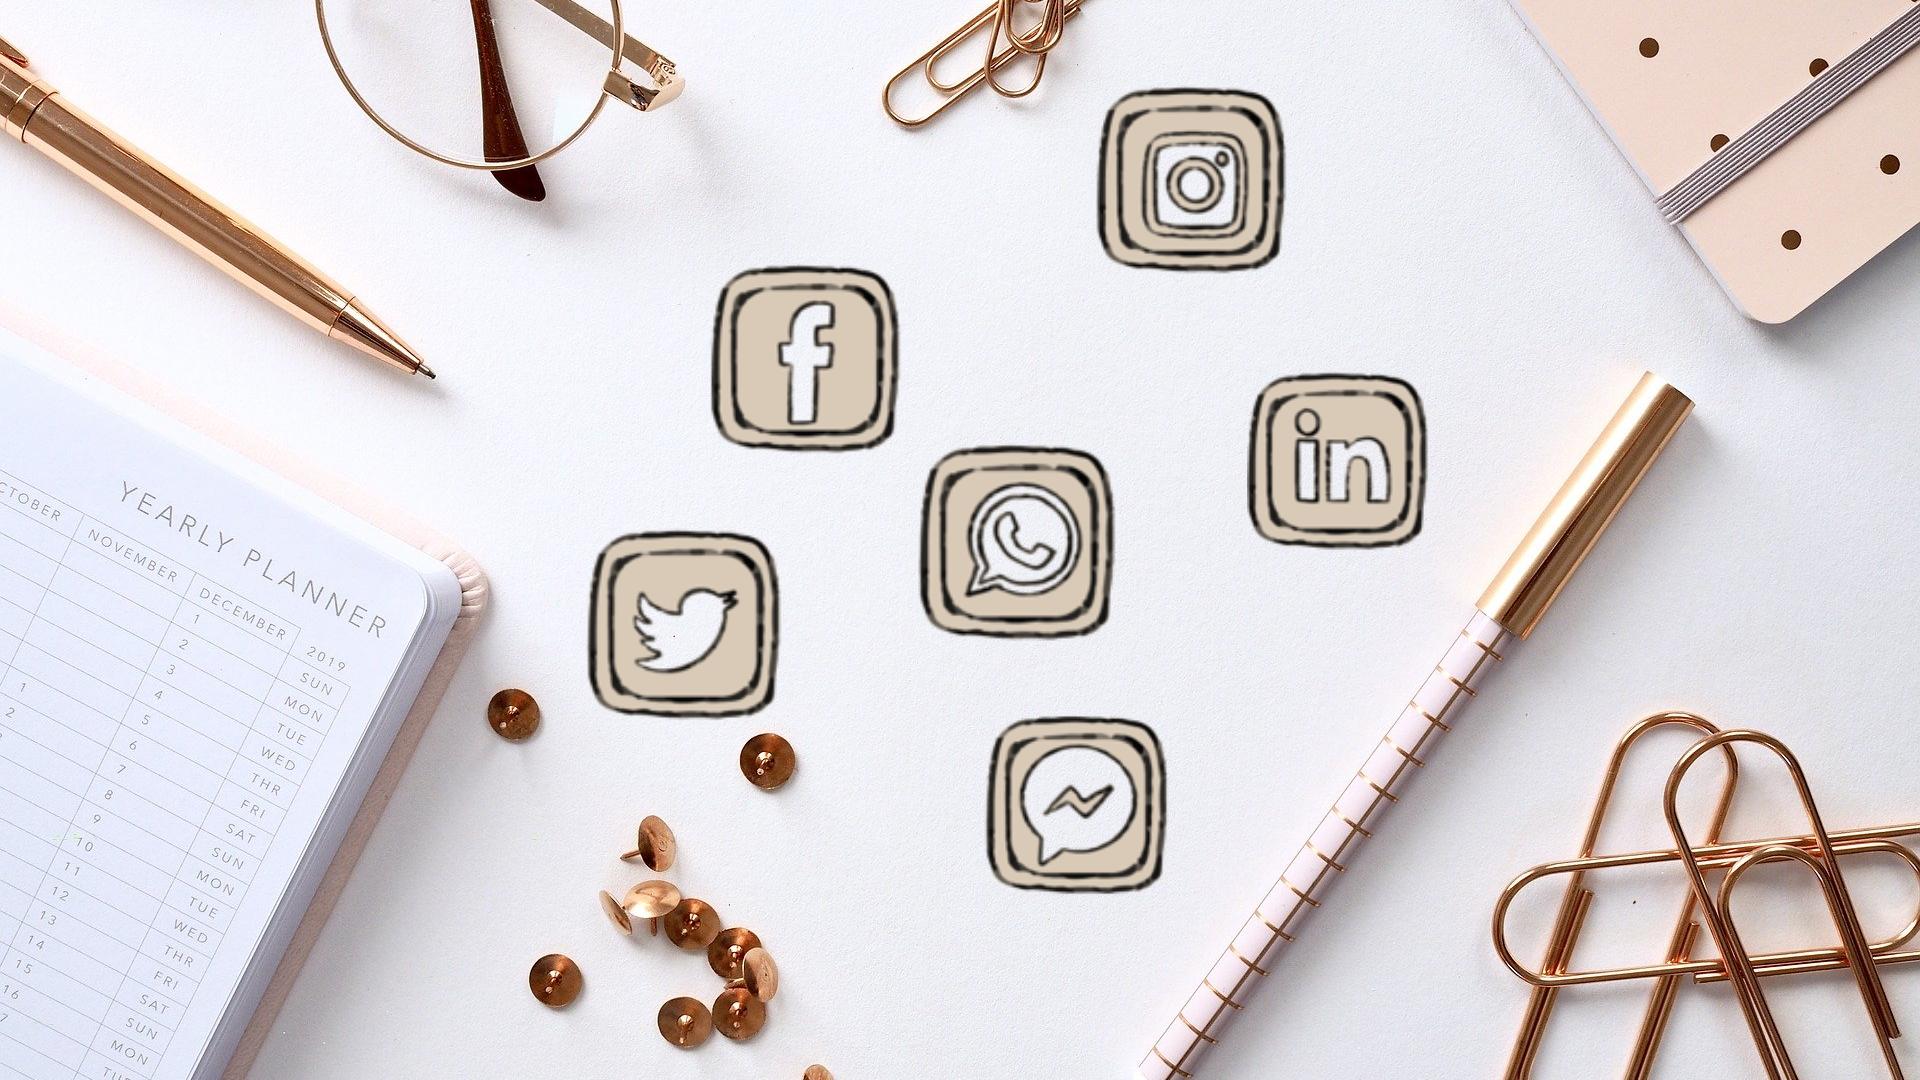 Curso de Social Ads: Facebook, Instagram, Messenger, Whats App y LinkedIn.